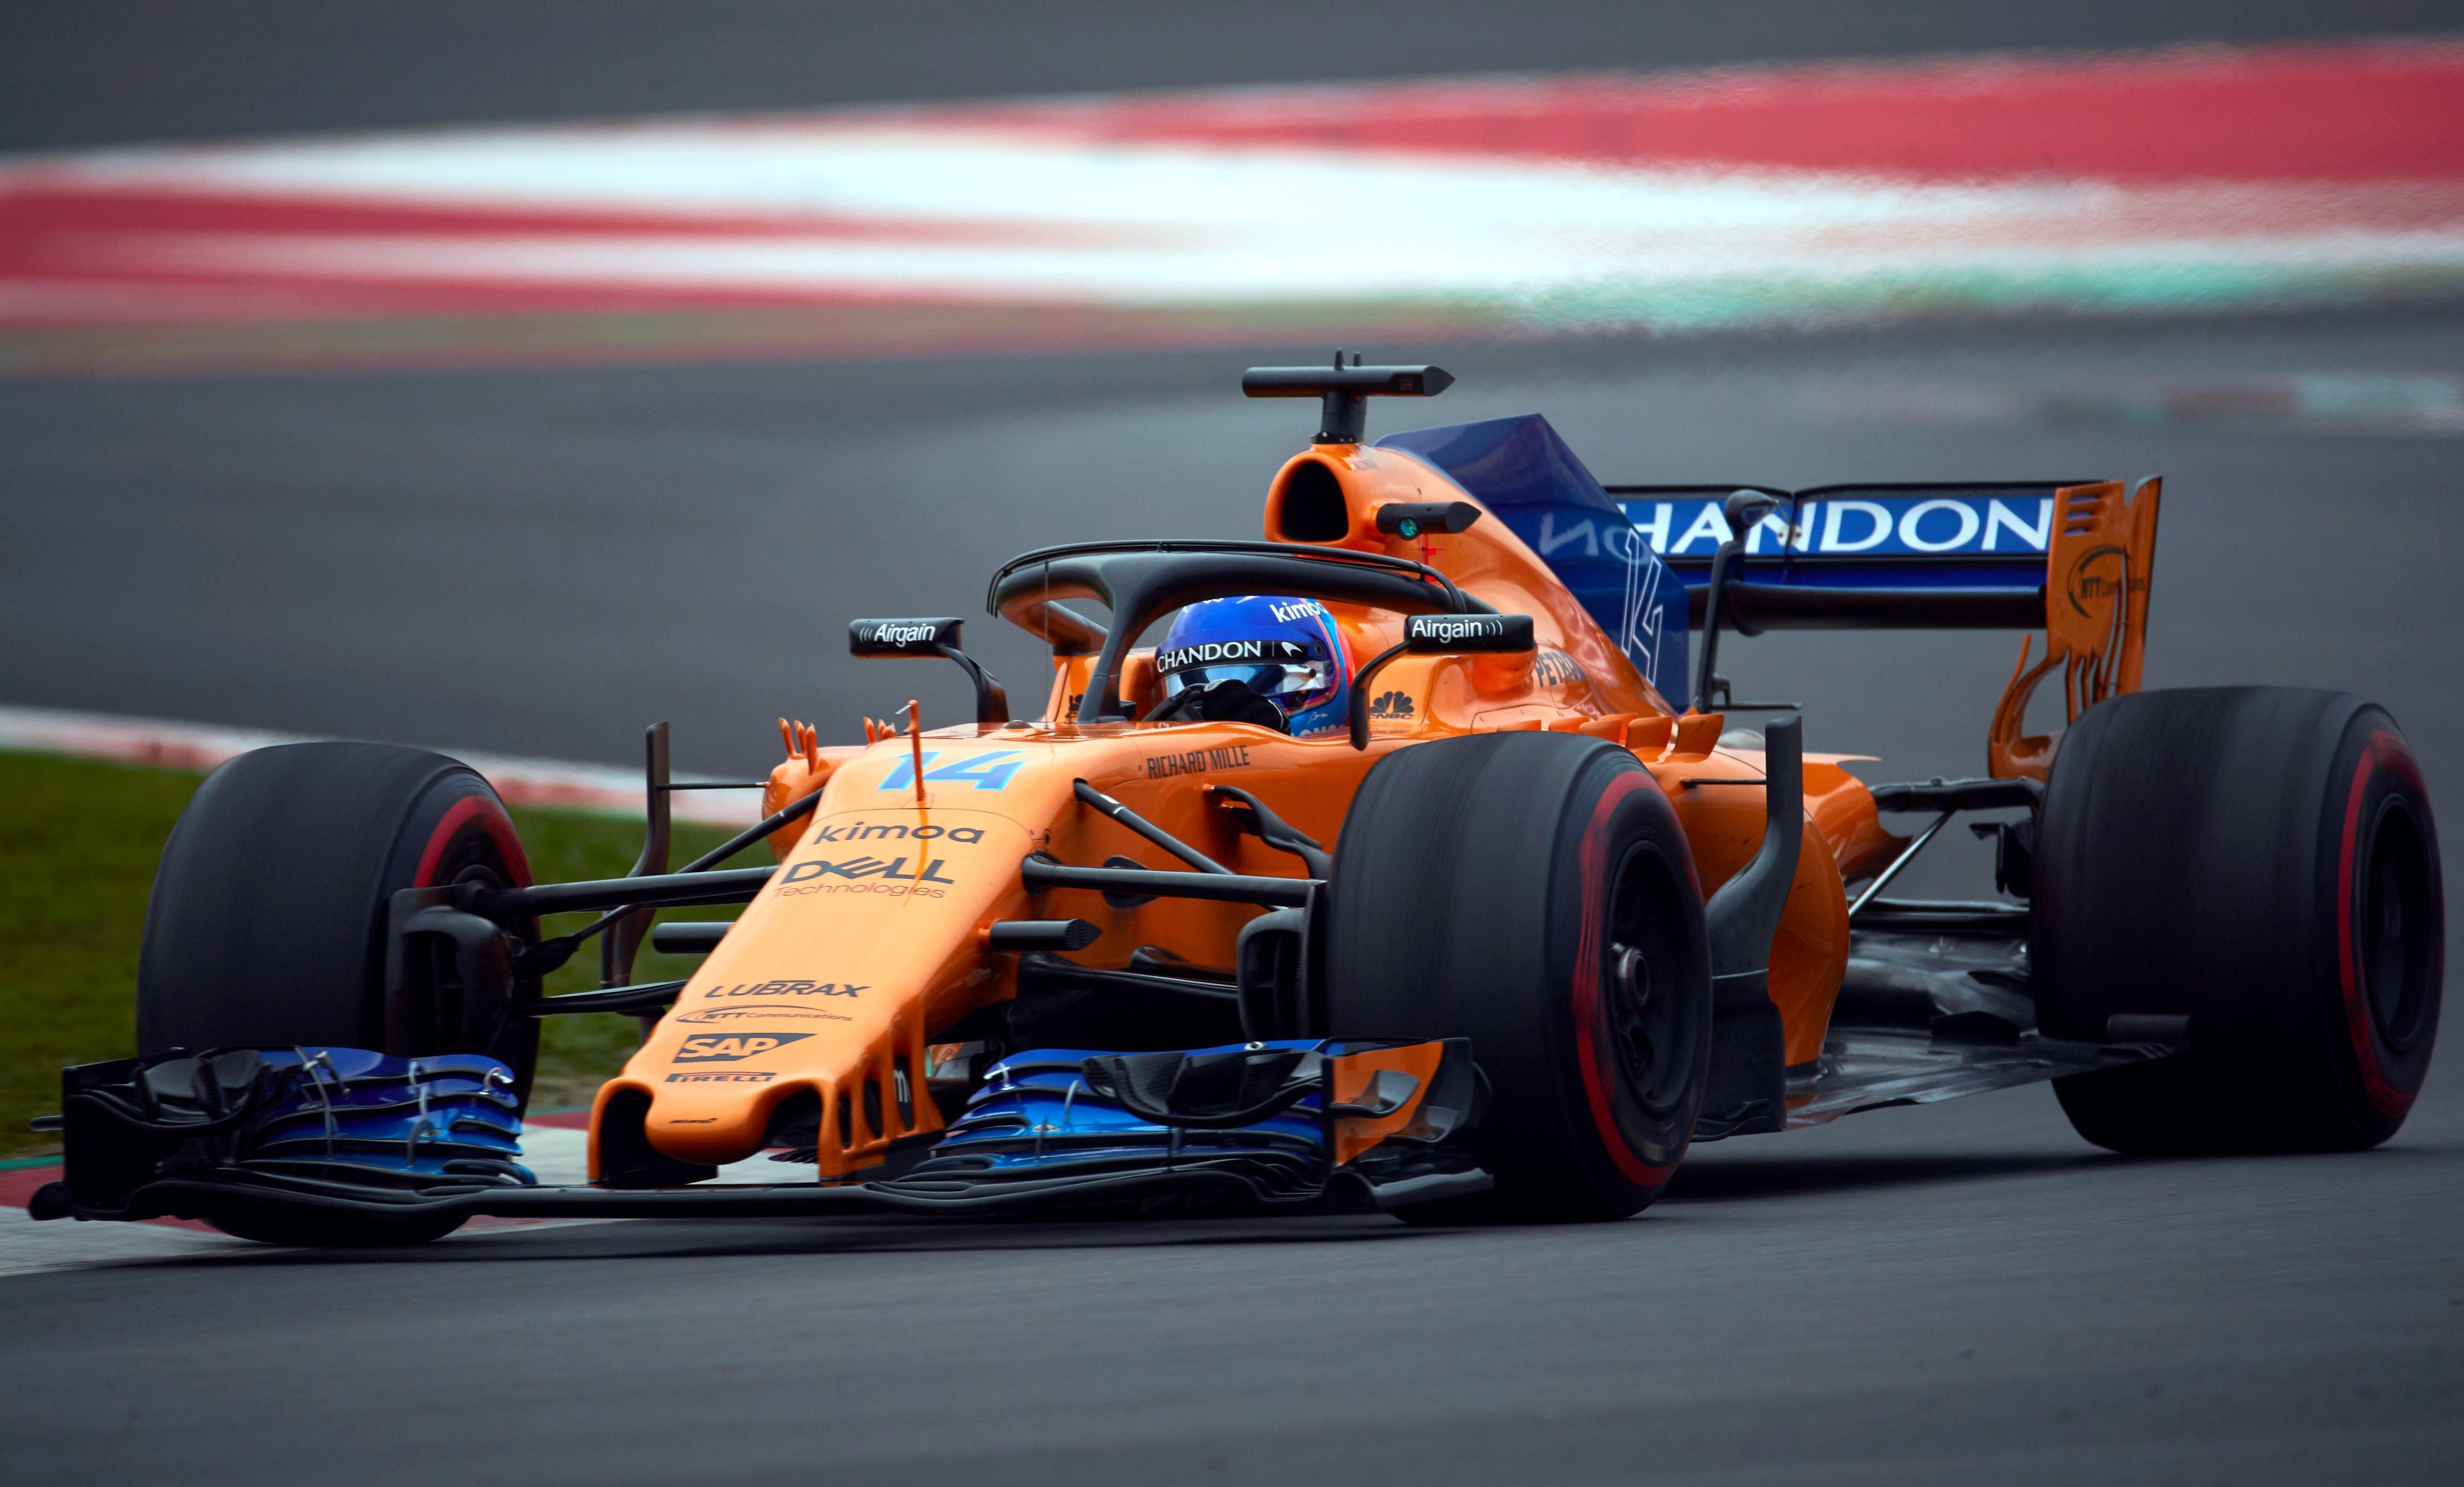 Lewis Hamilton vuelve a dominar prácticas y 'Checo' Pérez mejora